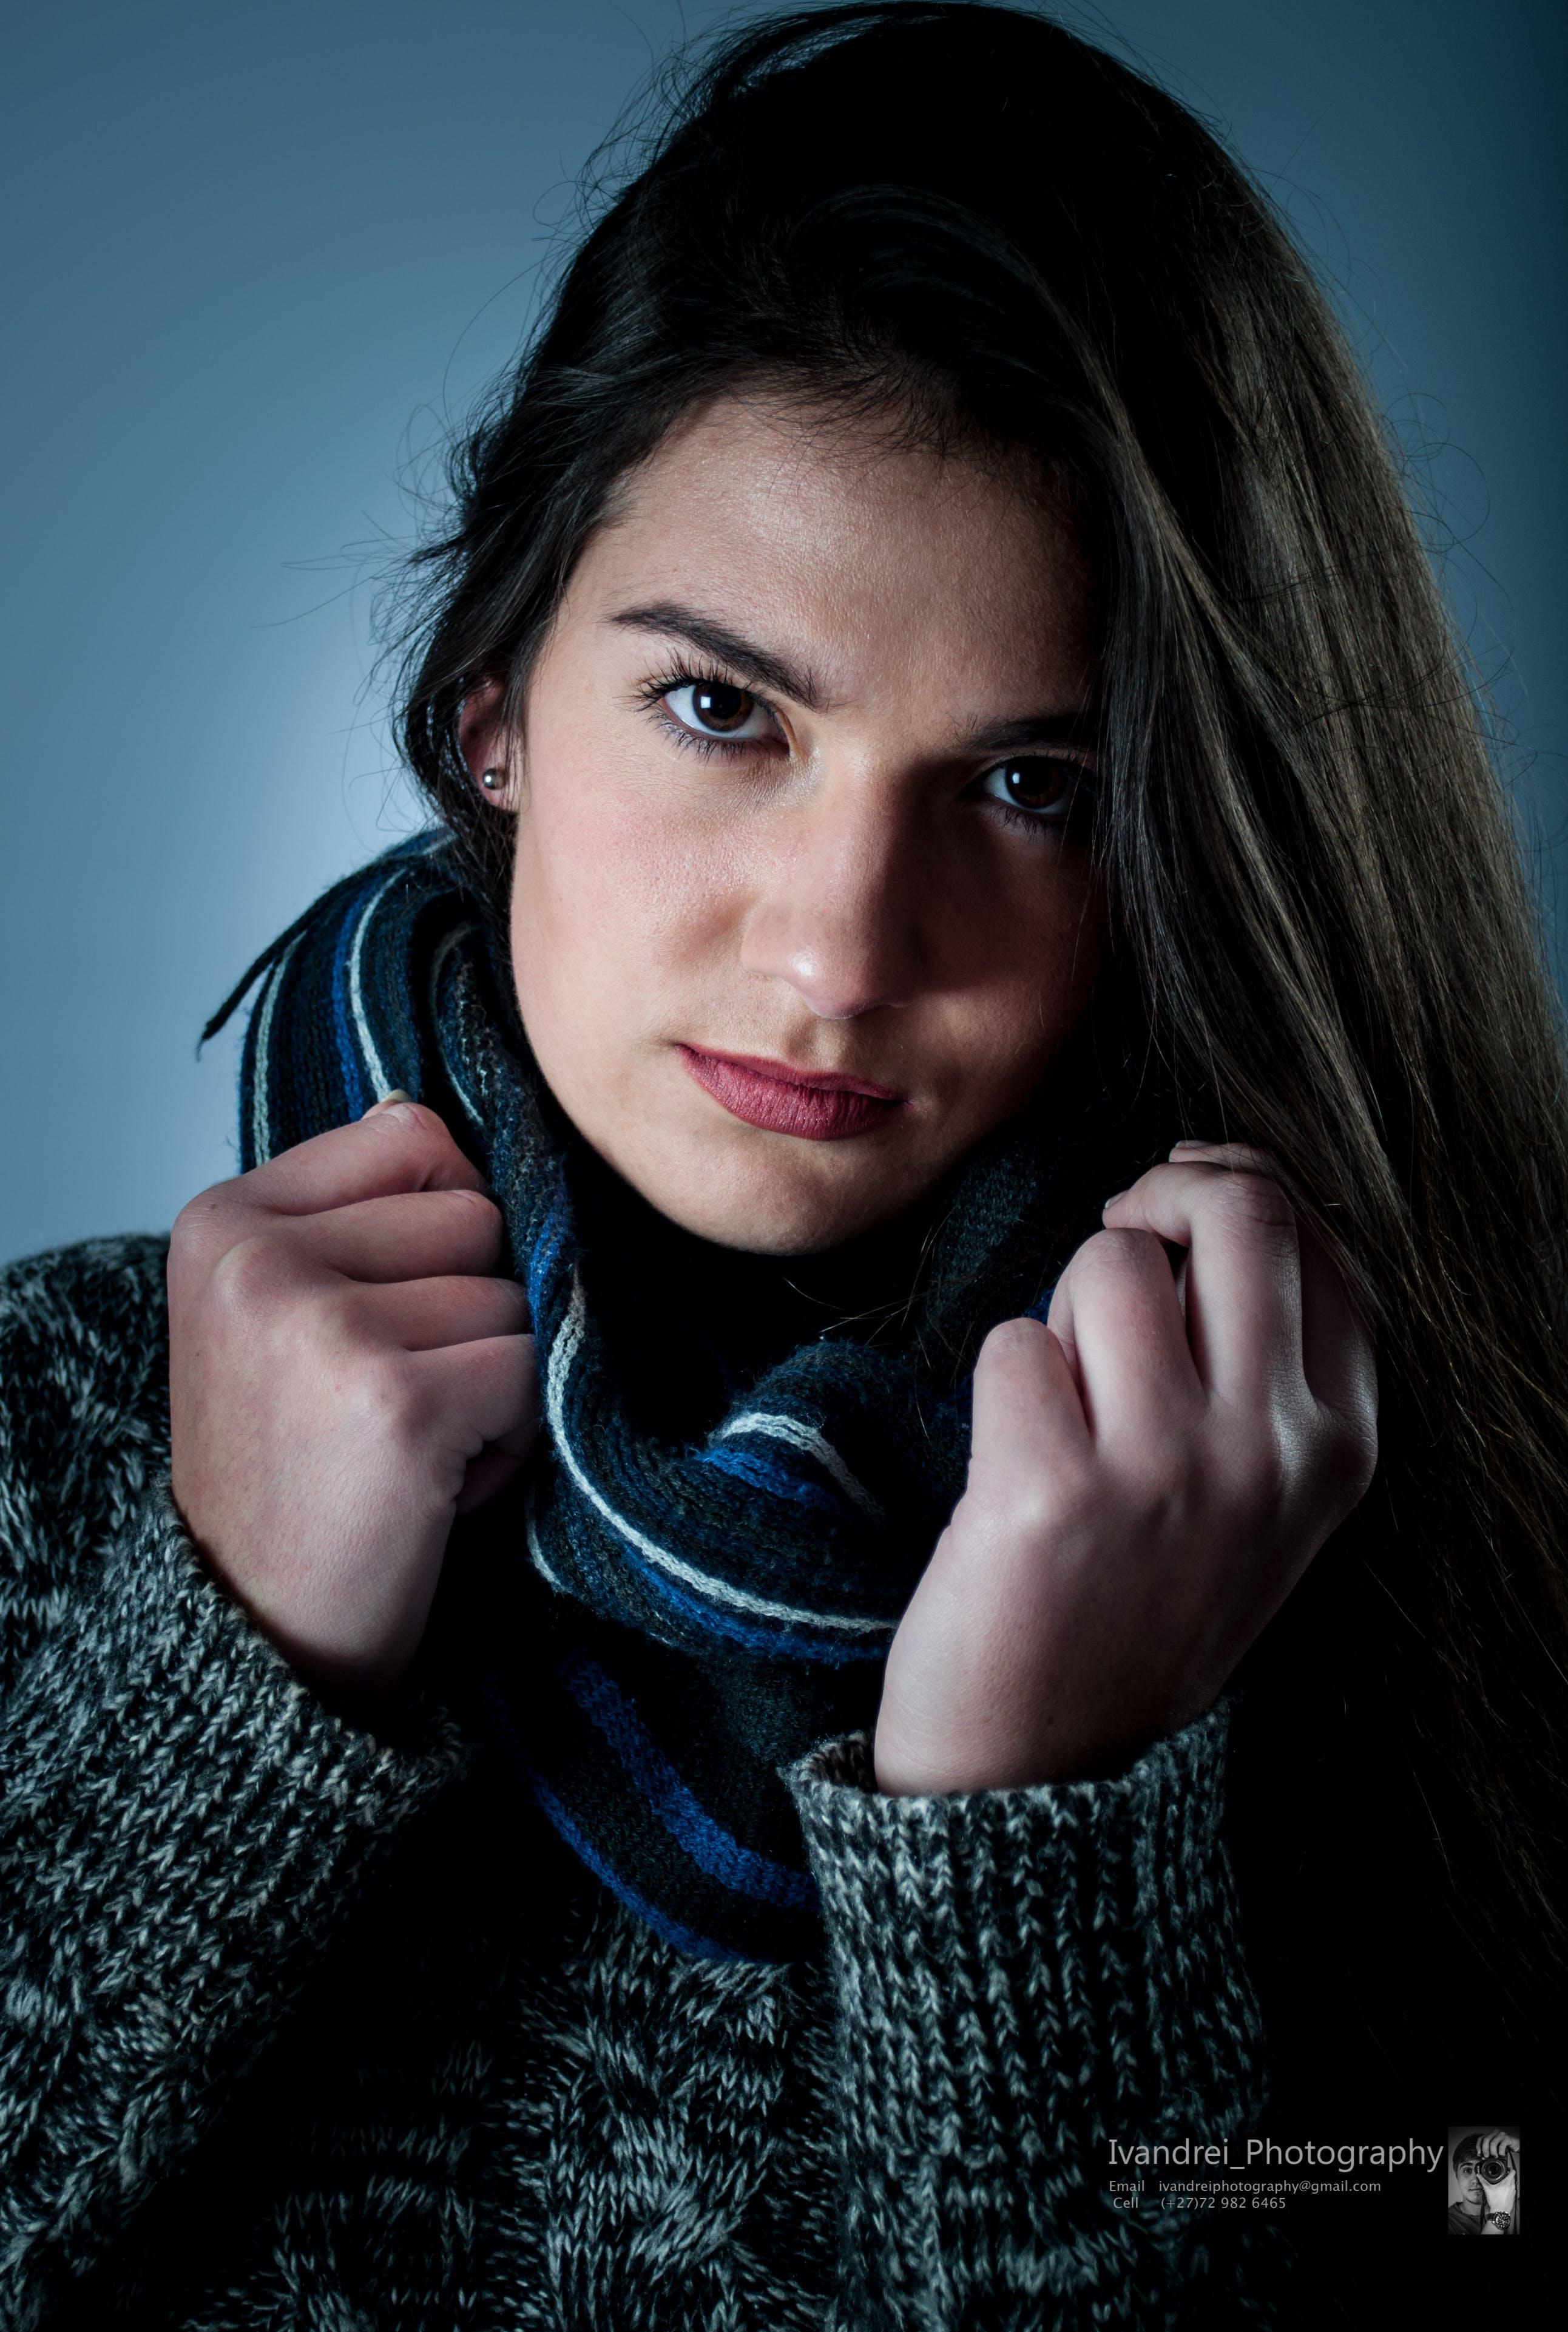 Free stock photo of girl, face, studio, beauty model